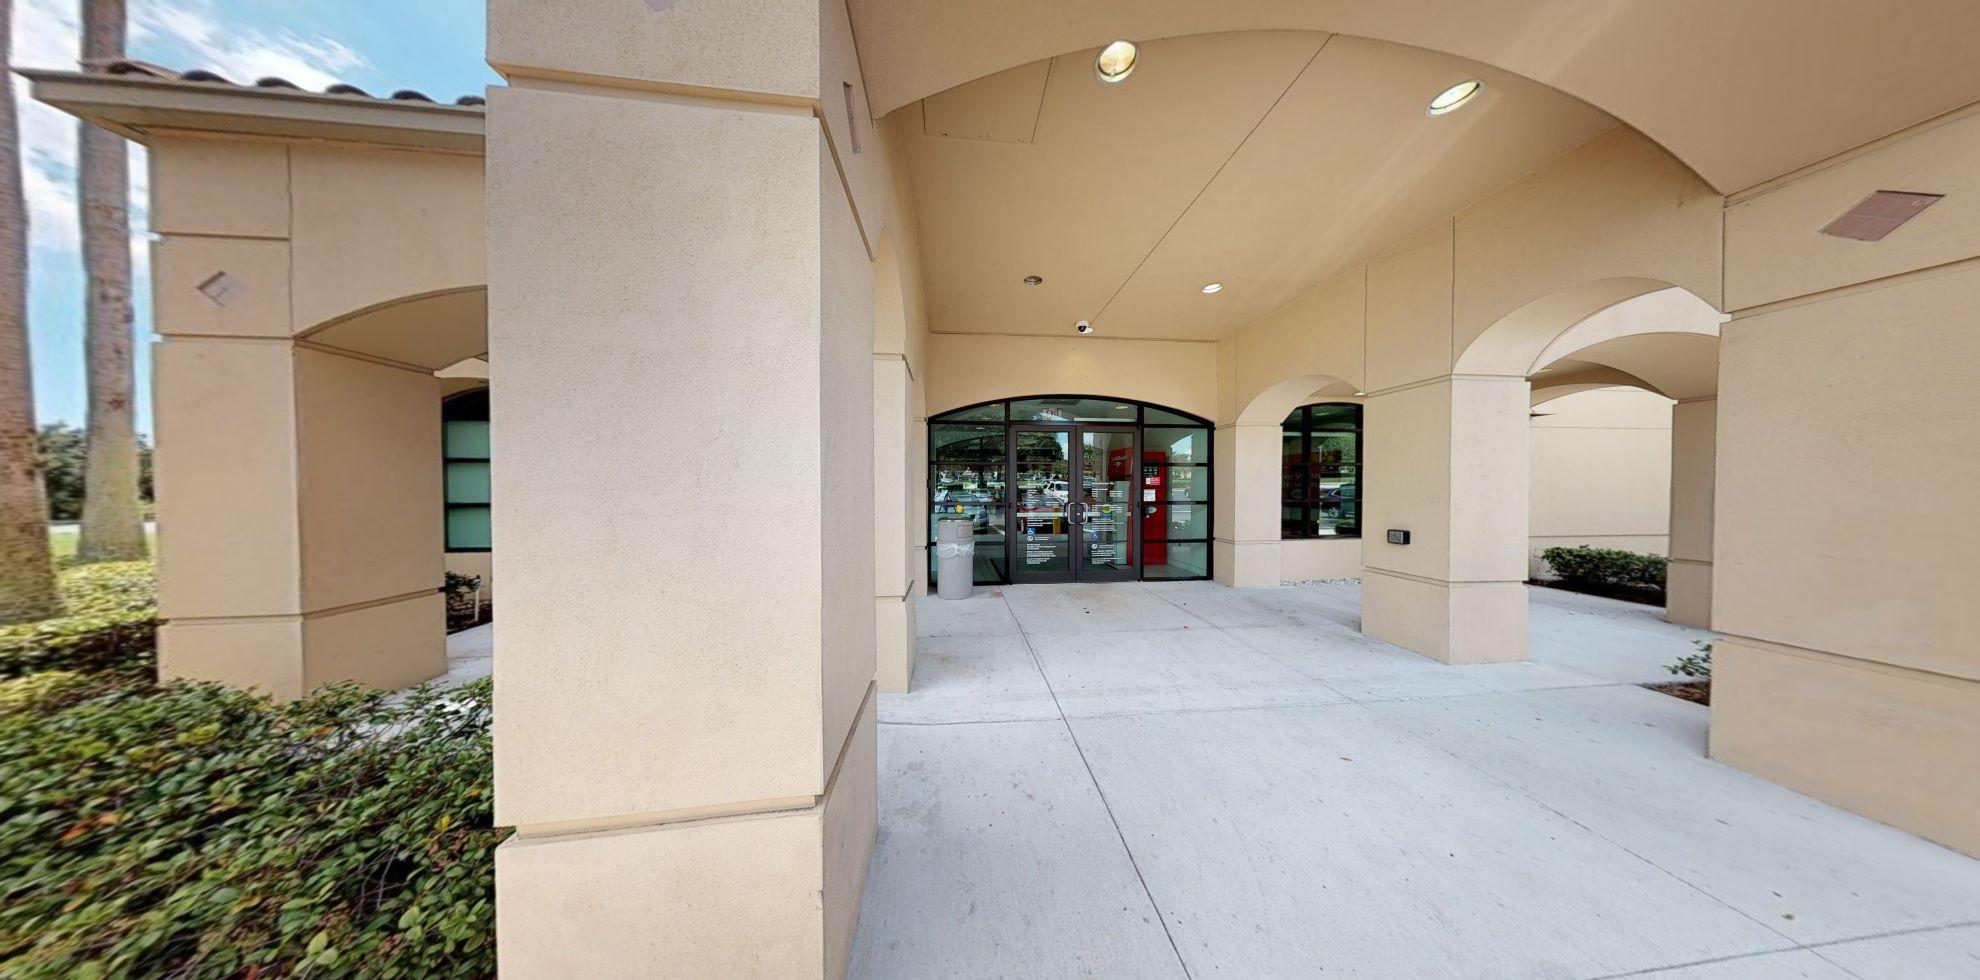 Bank of America financial center with drive-thru ATM and teller | 1080 Keene Rd, Dunedin, FL 34698